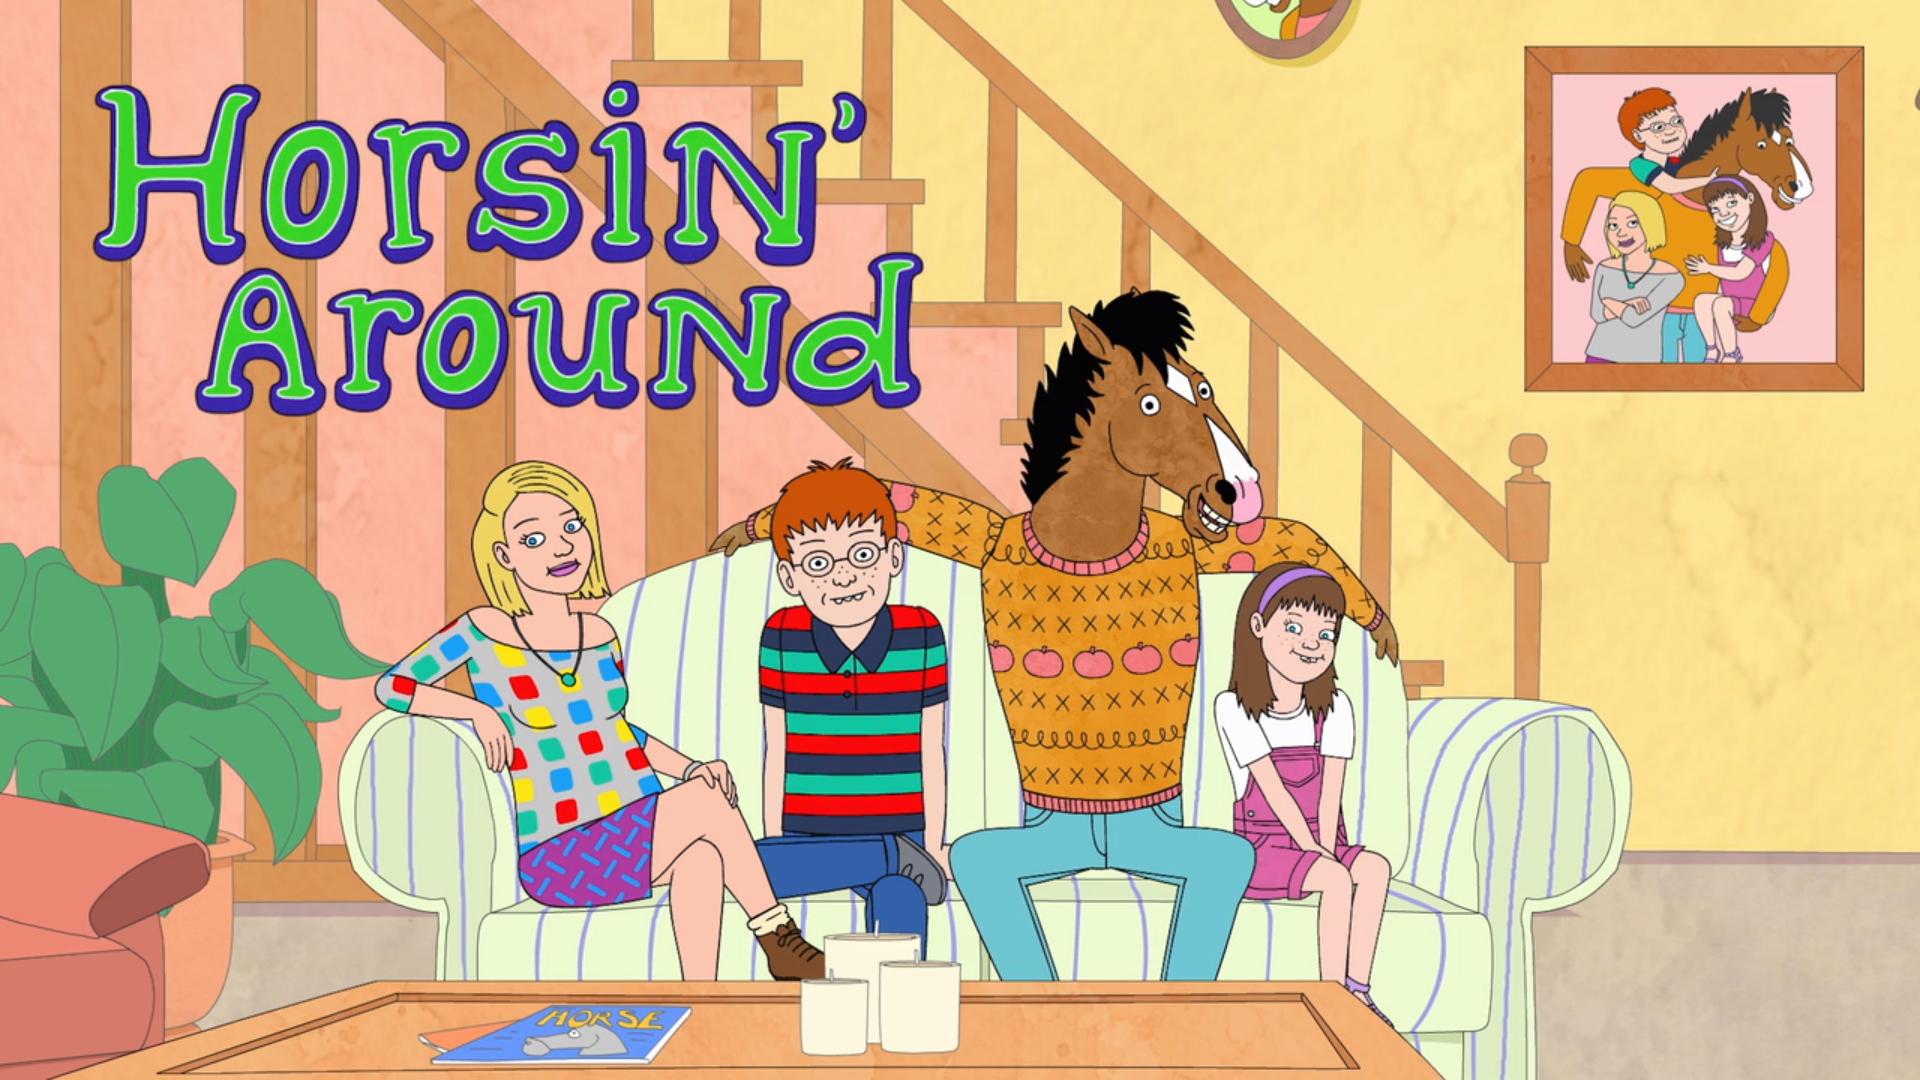 Horsin' Around | BoJack Horseman Wiki | FANDOM powered by Wikia